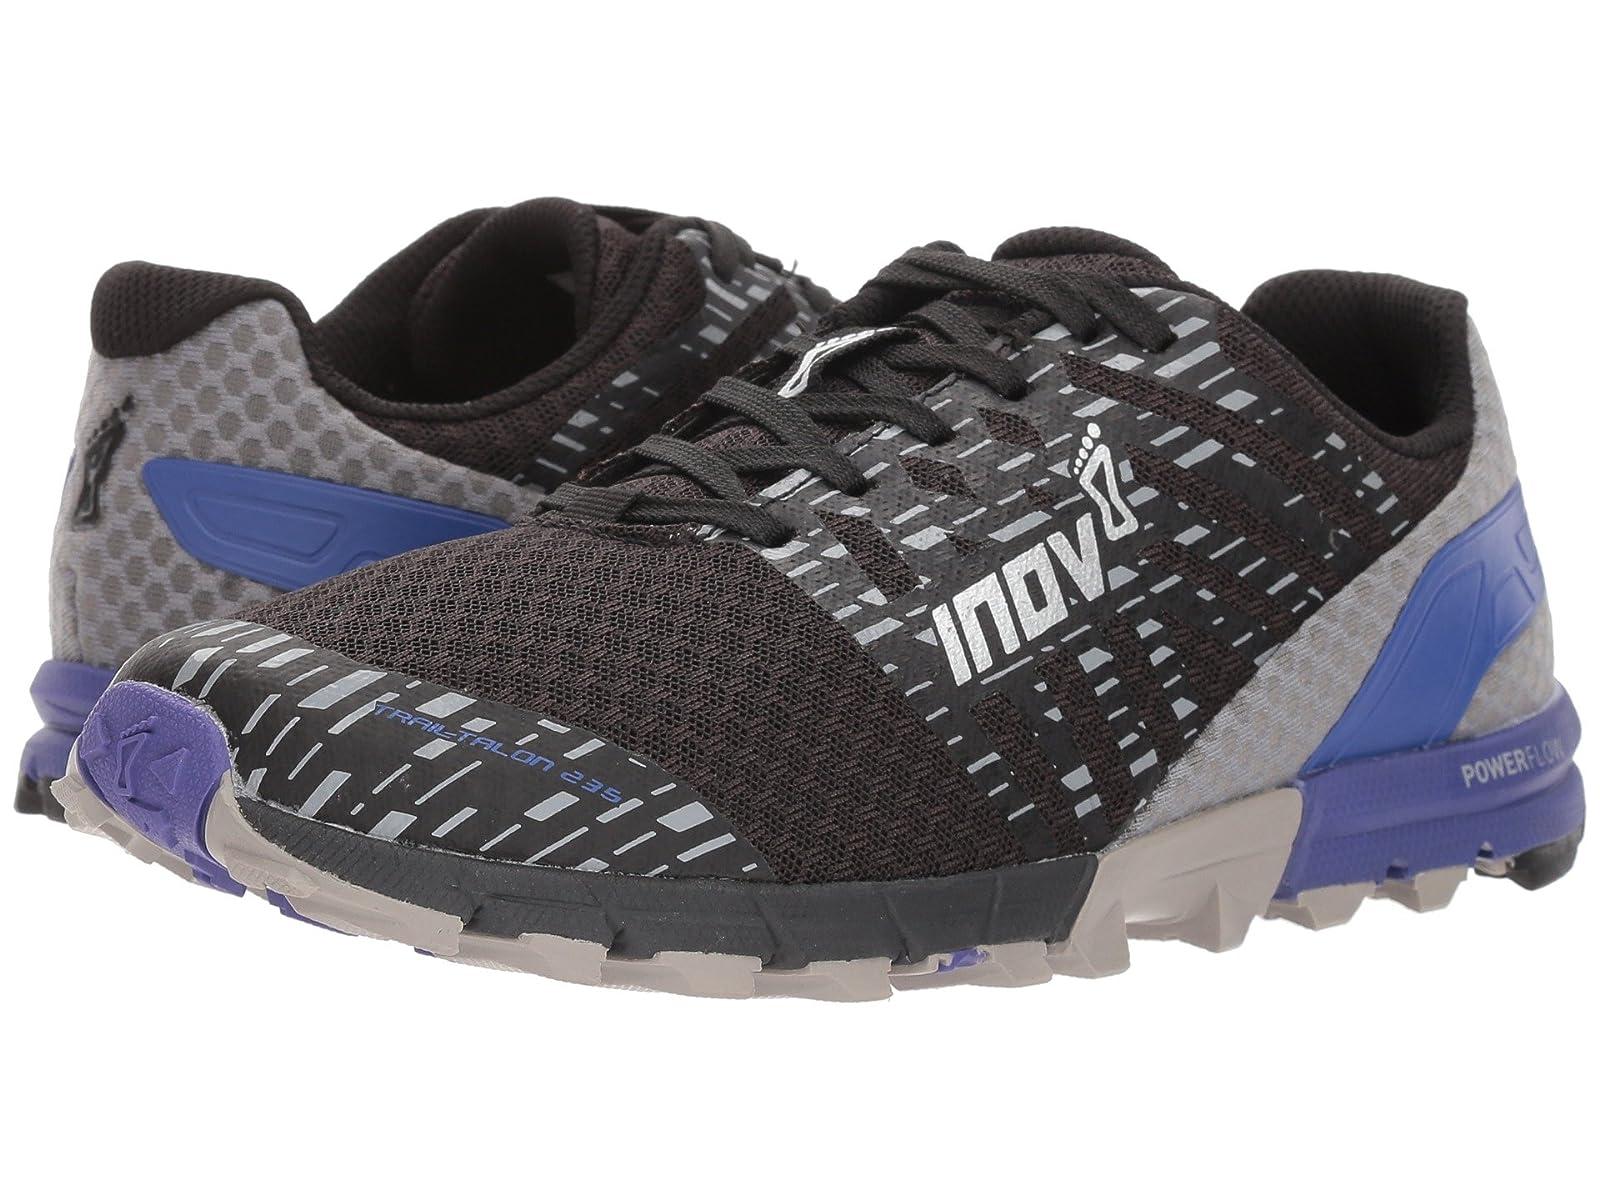 inov-8 Trailtalon 235Atmospheric grades have affordable shoes